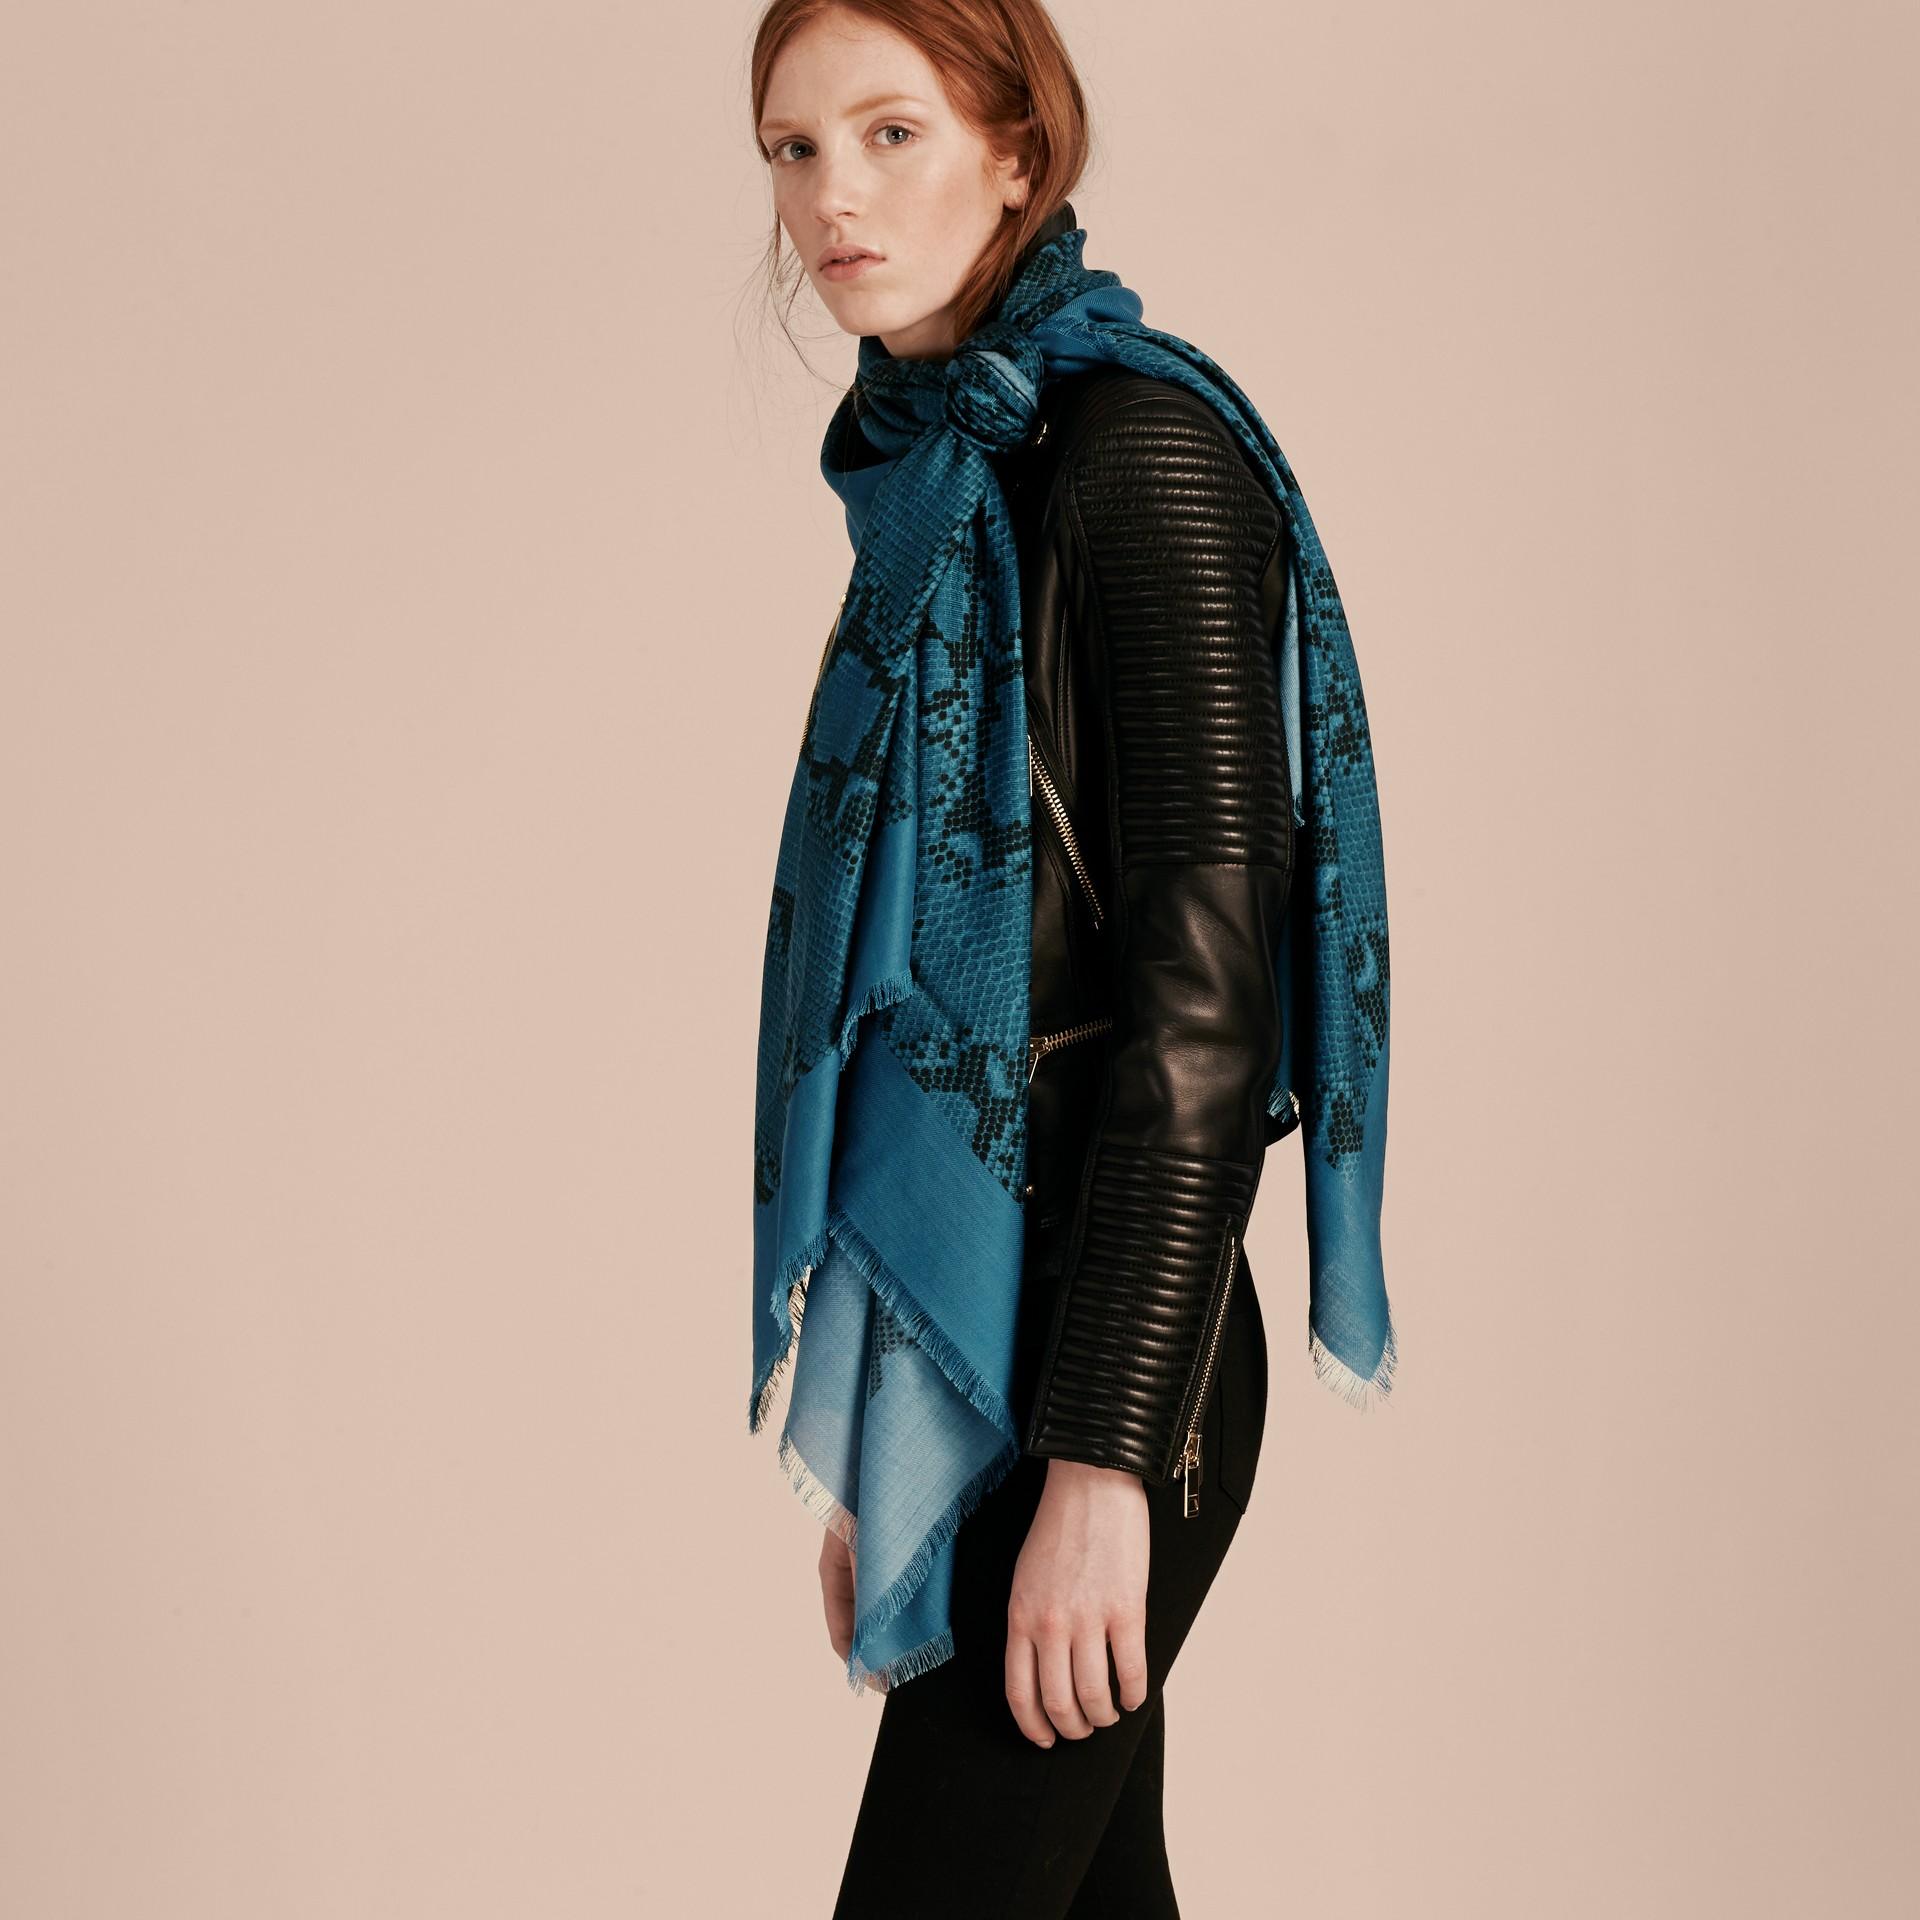 Mineral blue Poncho leve de lã, seda e cashmere com estampa de píton Mineral Blue - galeria de imagens 3